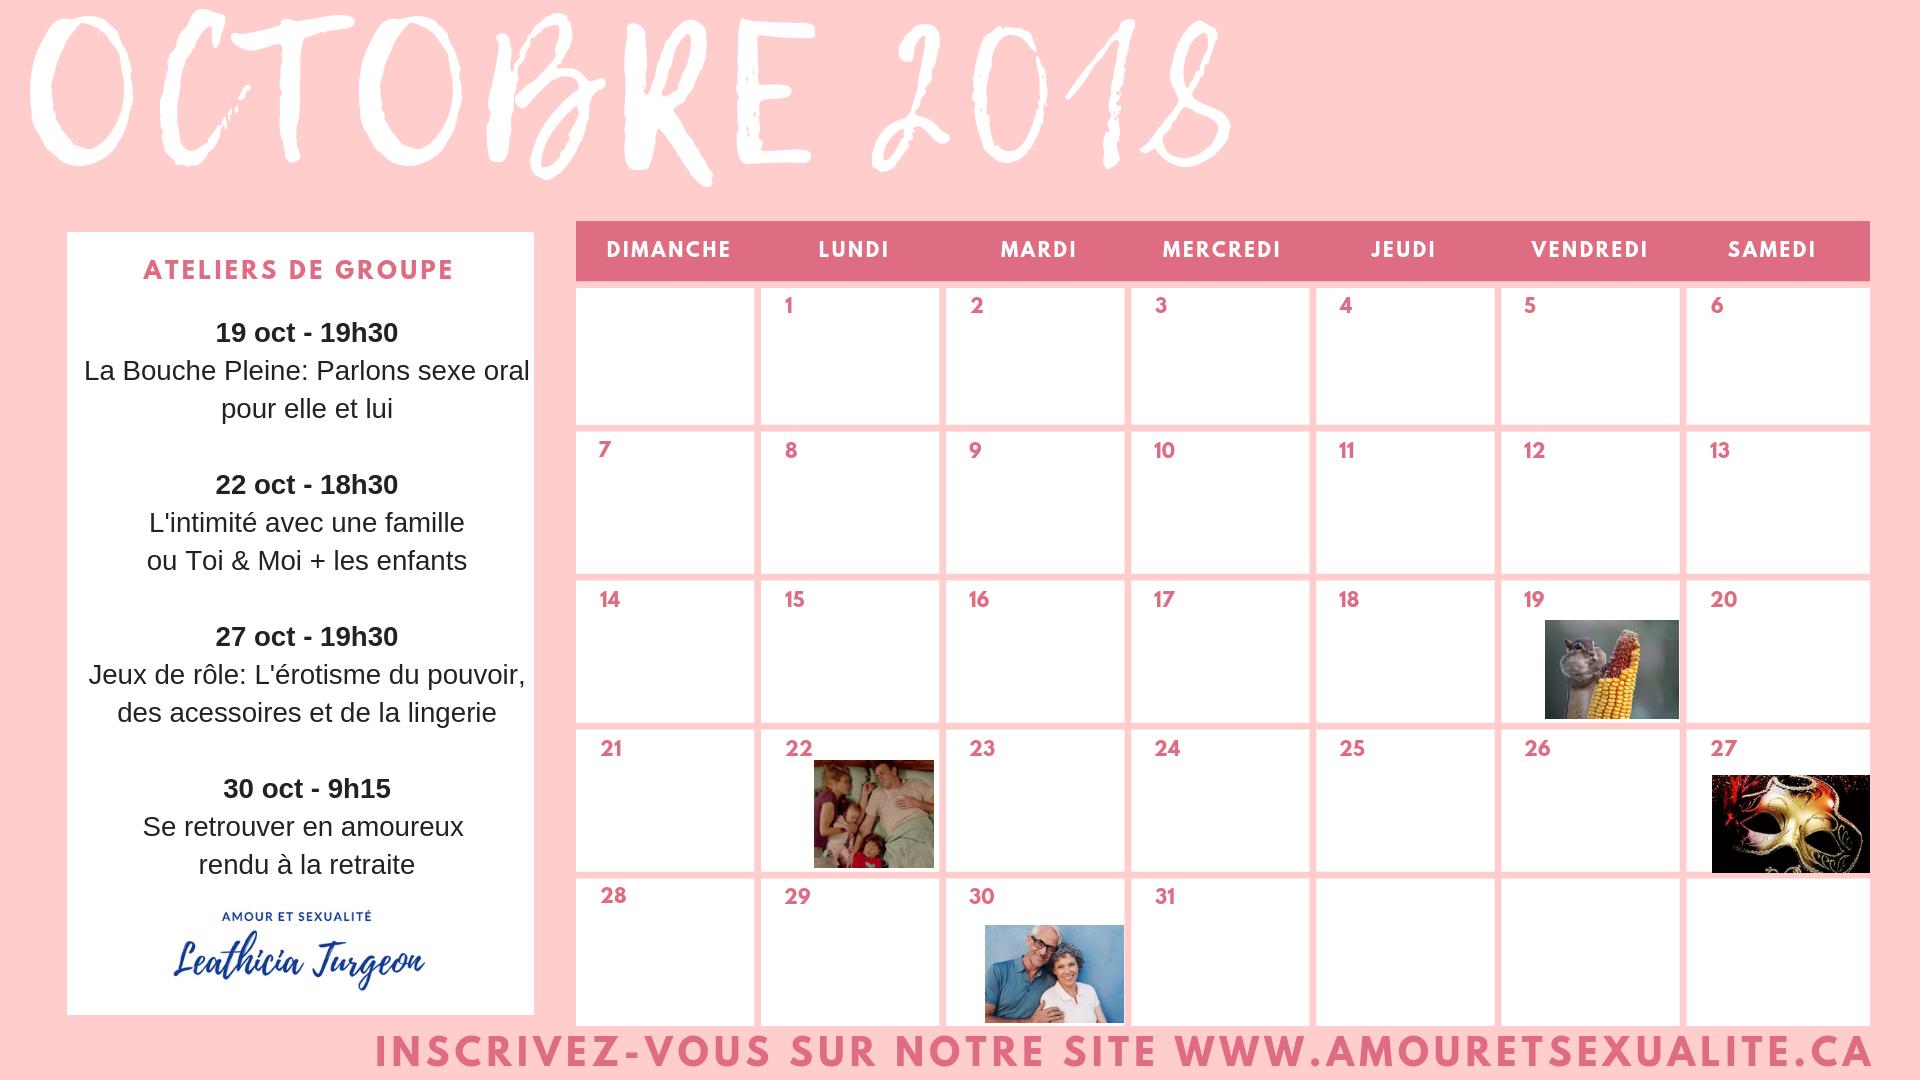 Calendrier des activités oct-nov-déc 2018 (4)